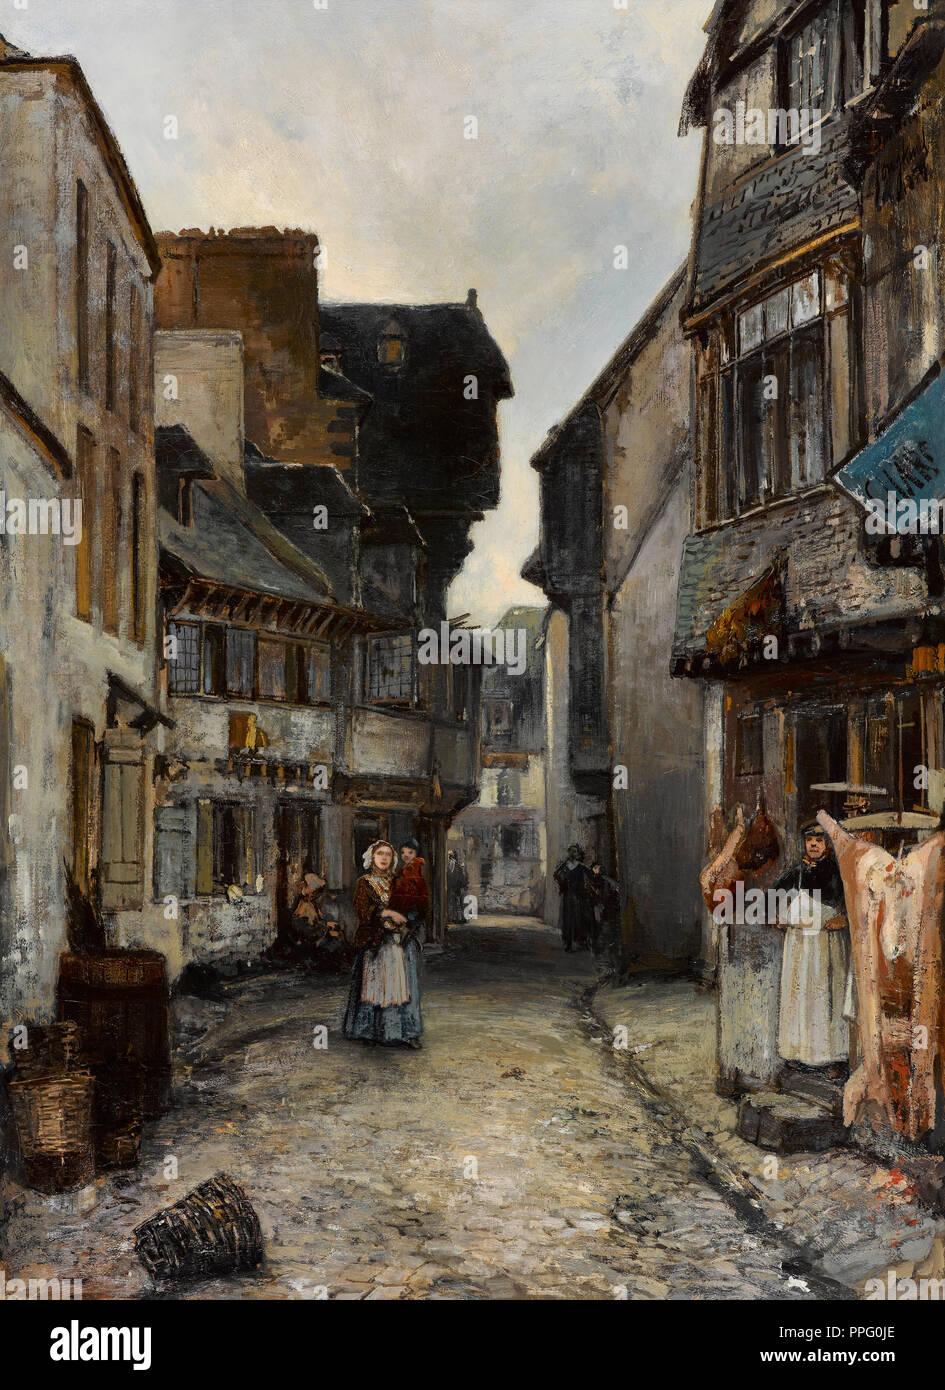 Johan Jongkind - A Street in Landerneau 1851 Oil on canvas. Gemeentemuseum Den Haag, The Hague, Netherlands. - Stock Image